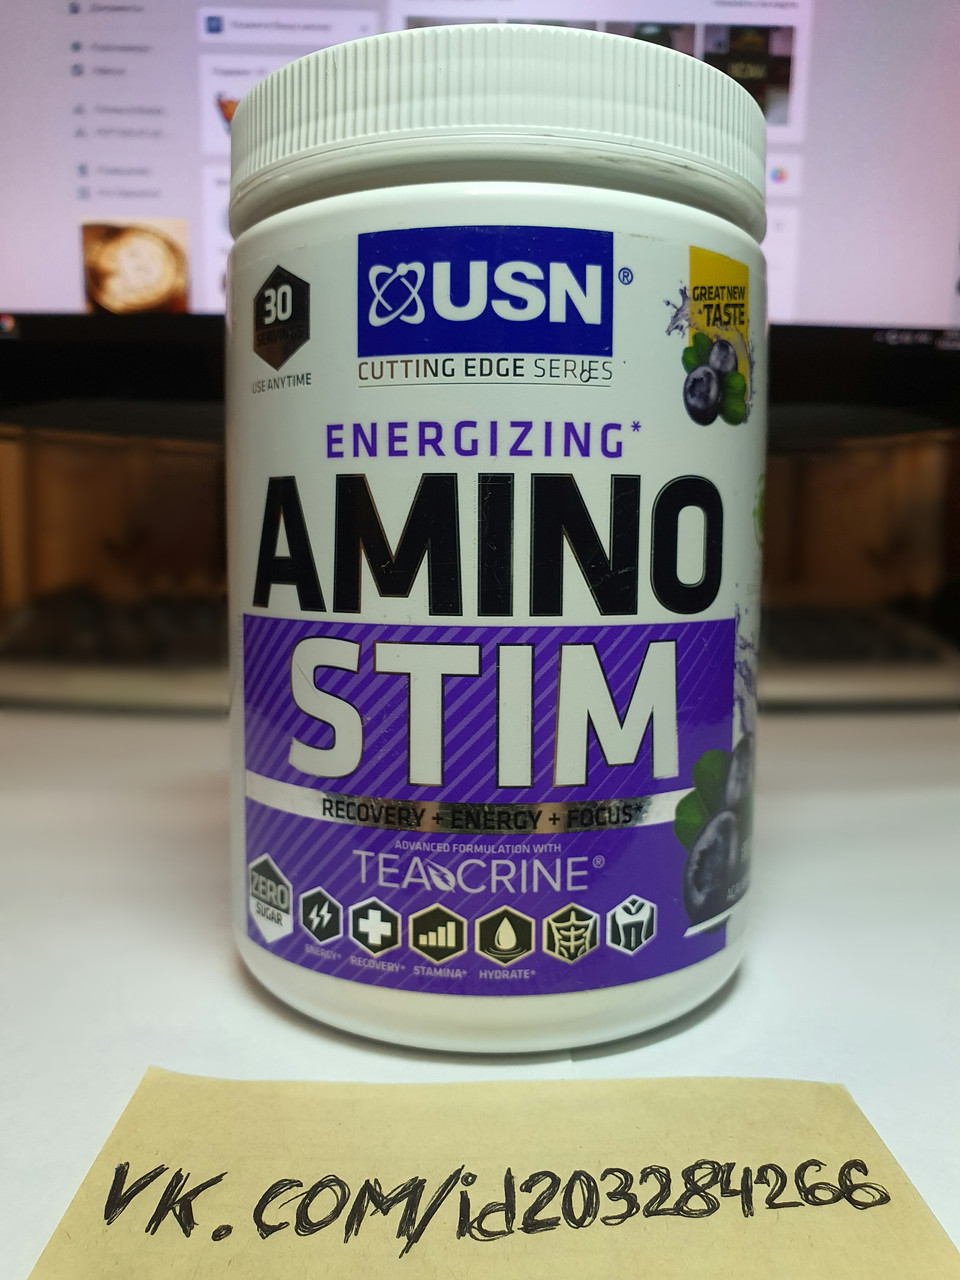 Комплекс аминокислот USN Amino Stim 330g 30 порций